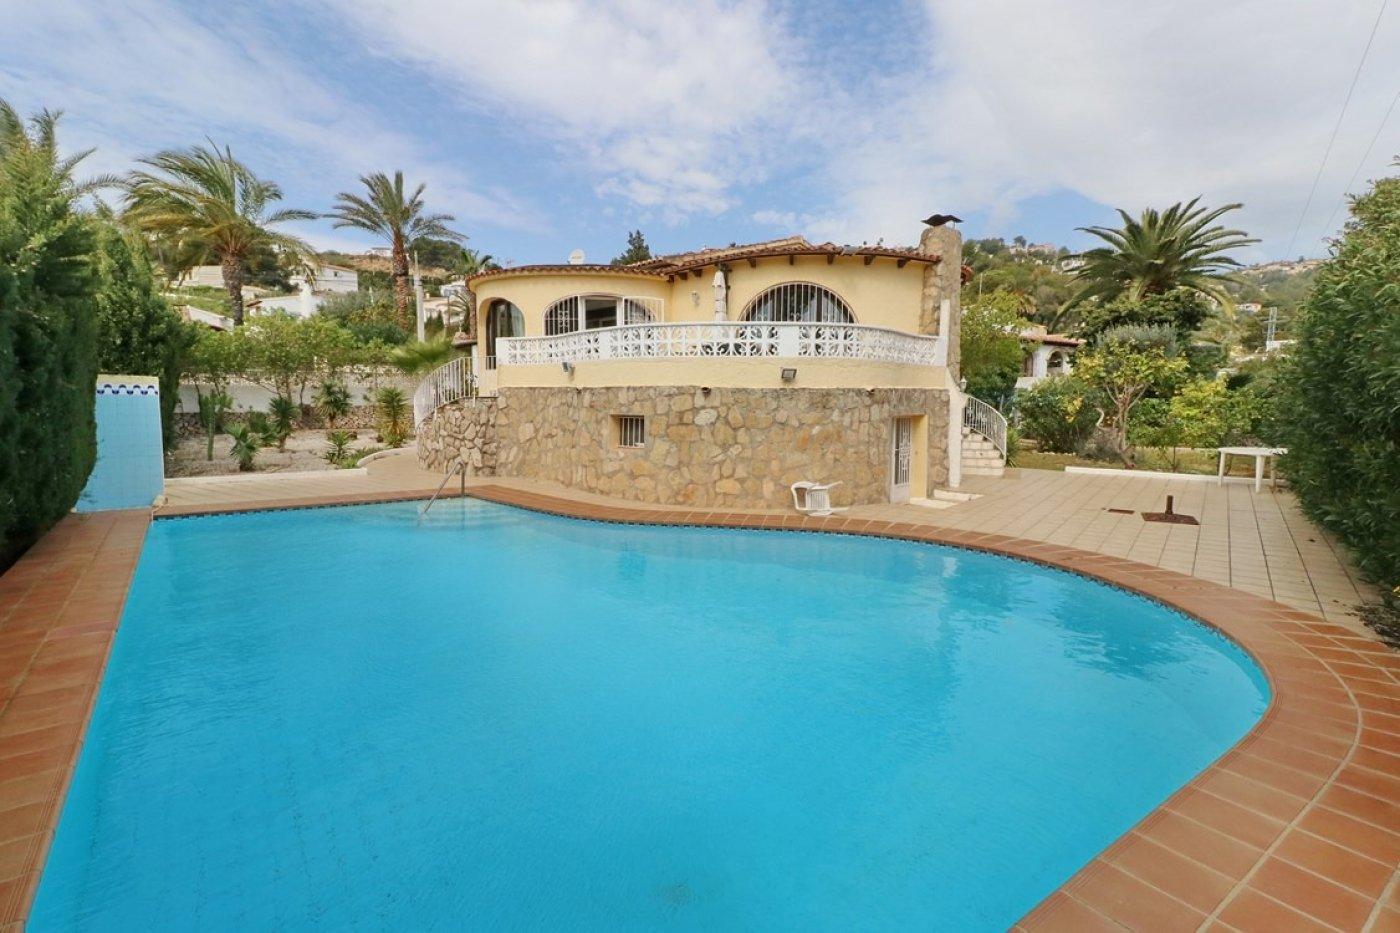 villa en benissa-costa · urb-montemar 275000€